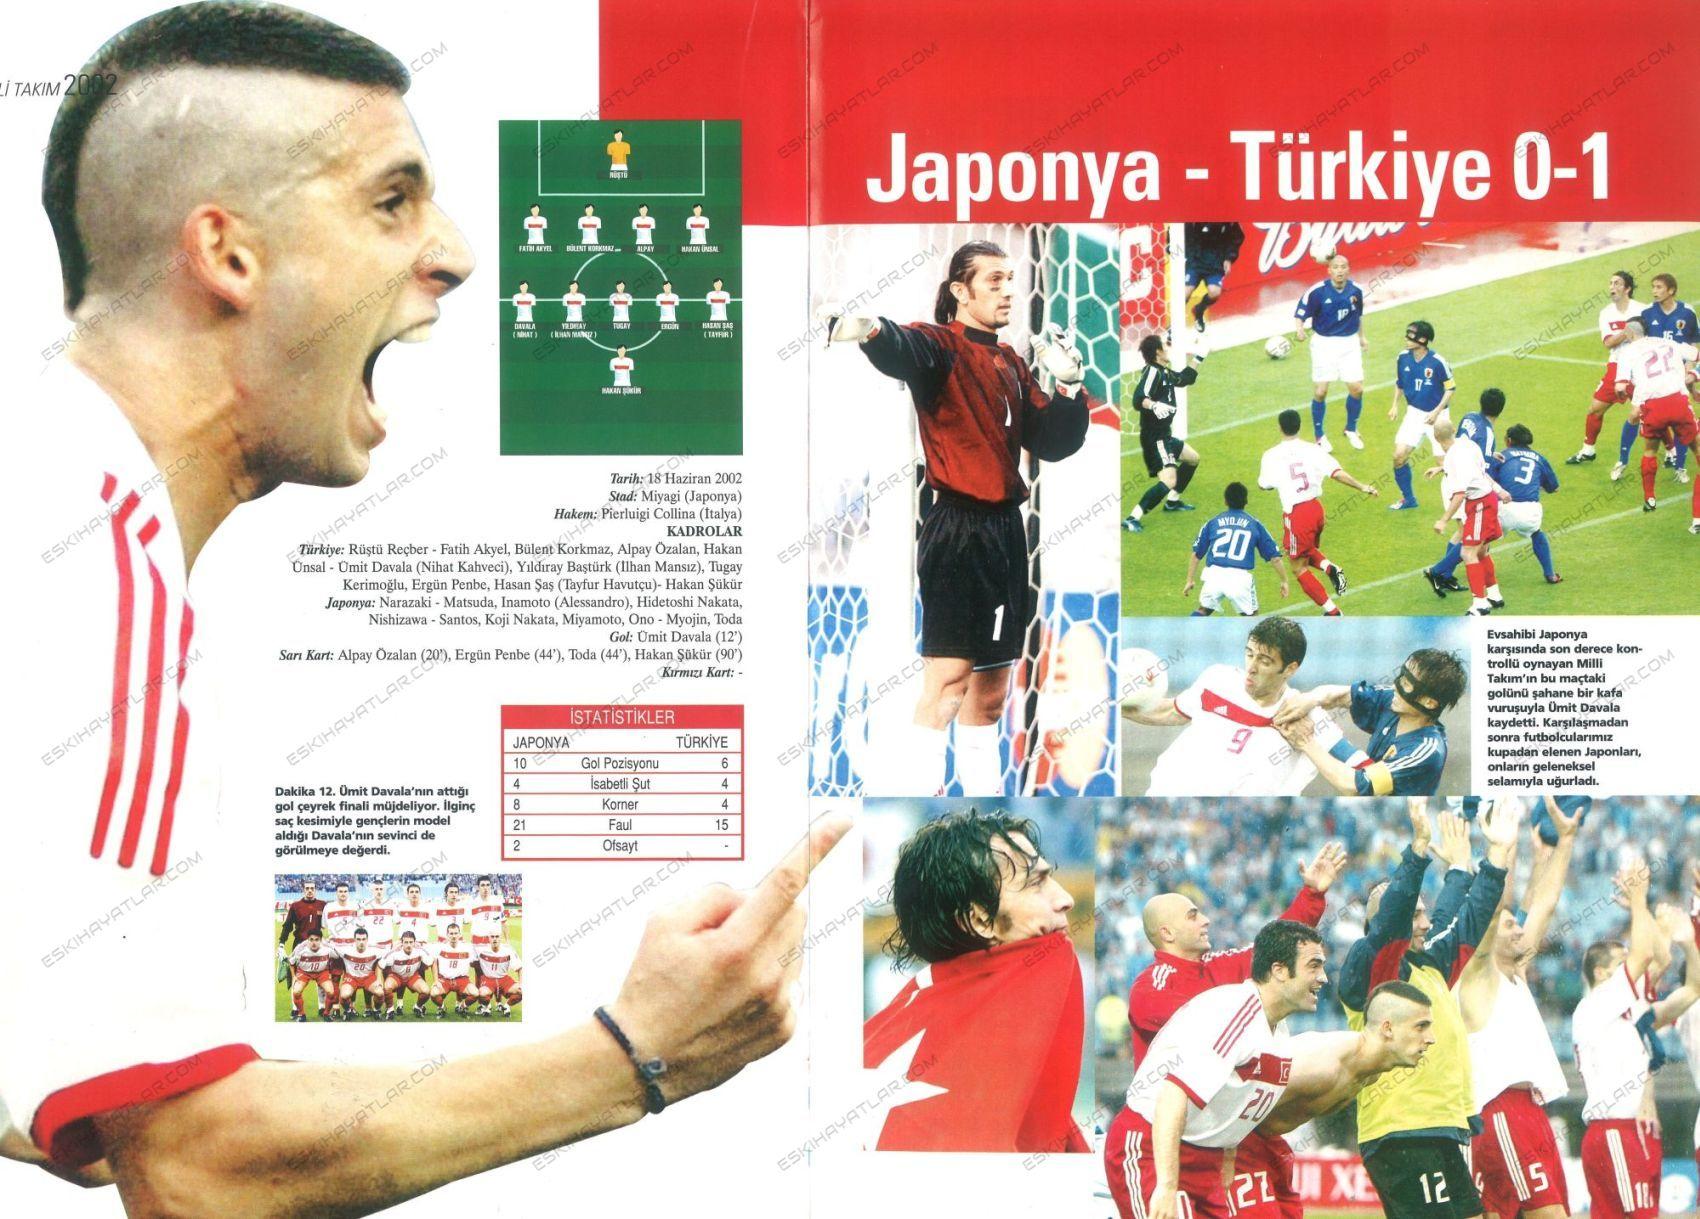 0406-turkiye-a-milli-takimi-2002-dunya-kupasi-kadrosu-aktuel-dergisi (8)